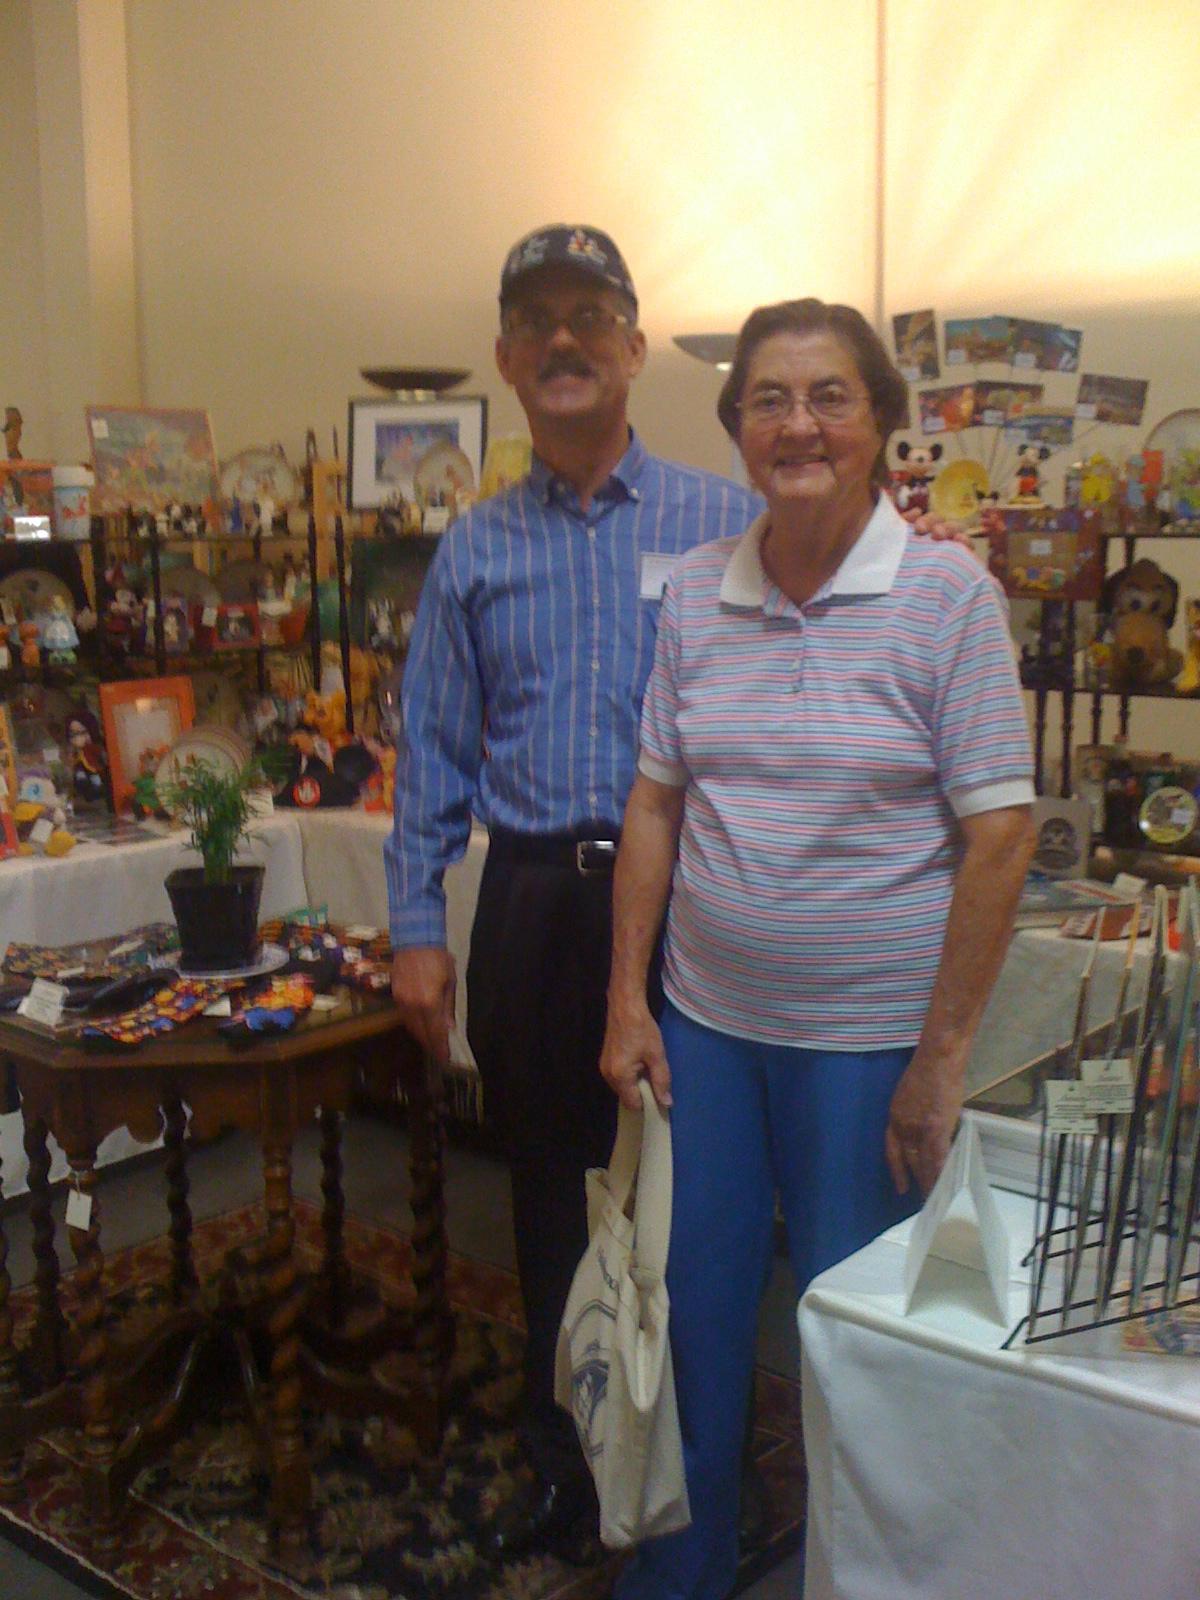 Chuck Pansarosa & his mother, Bobbie.  May 20, 2011.  Serendipity Antique Show.  Fresno, California